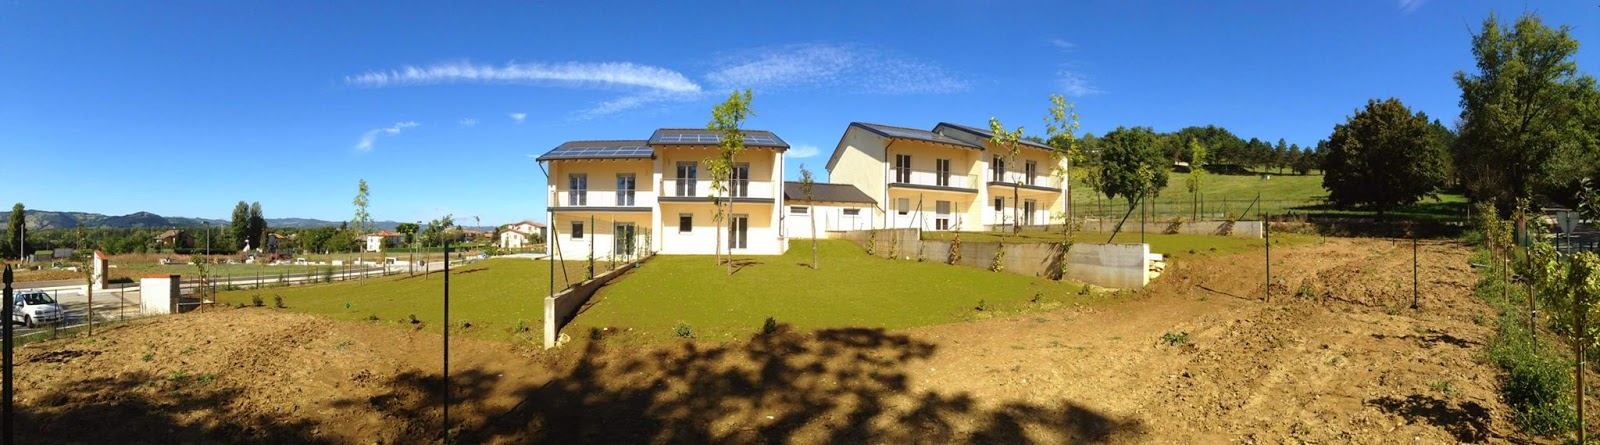 Abitazioni in legno - GM Costruzioni